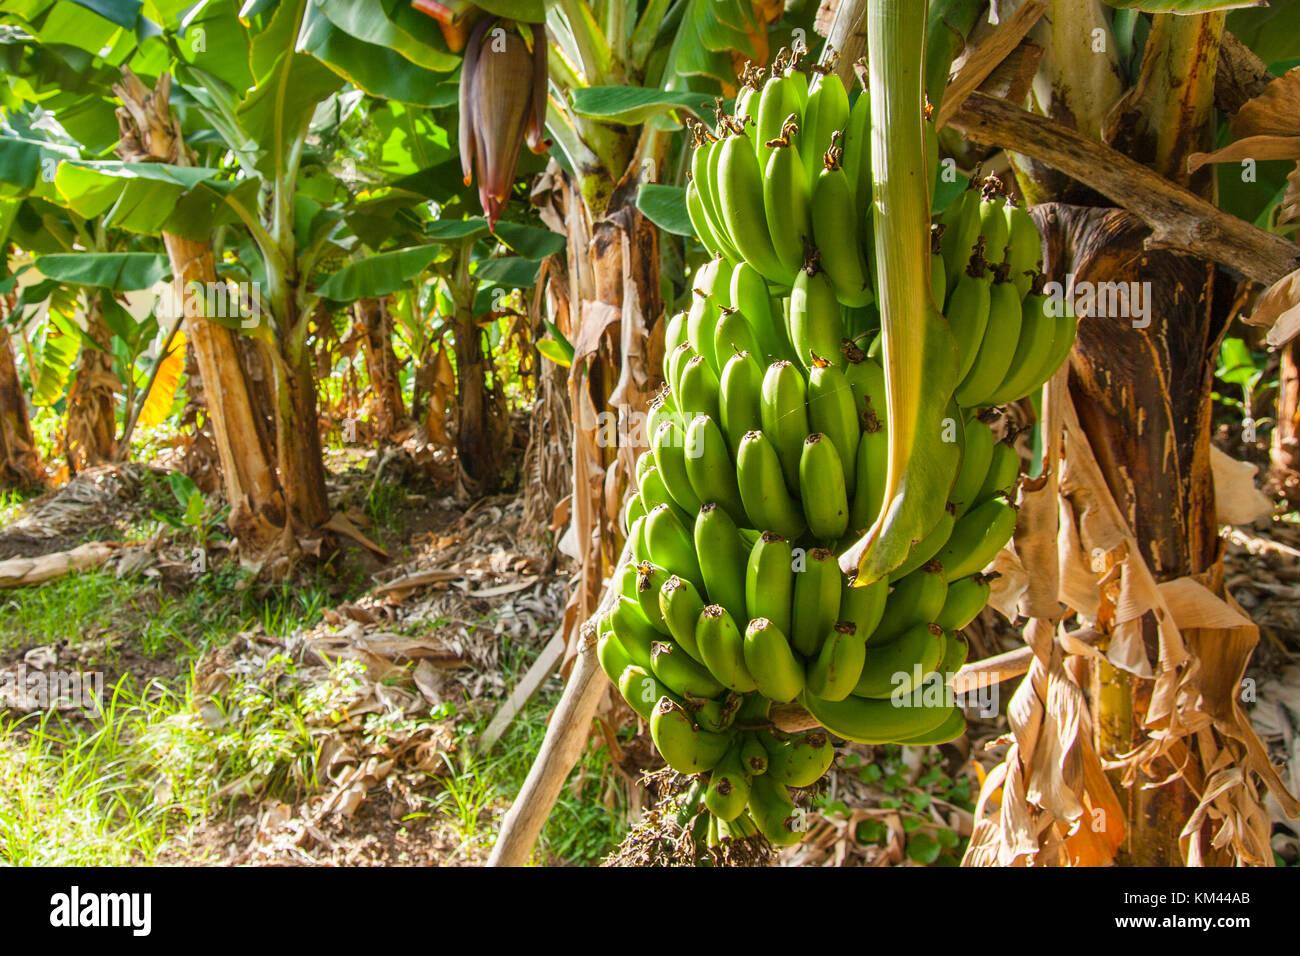 Banana plantation - Stock Image